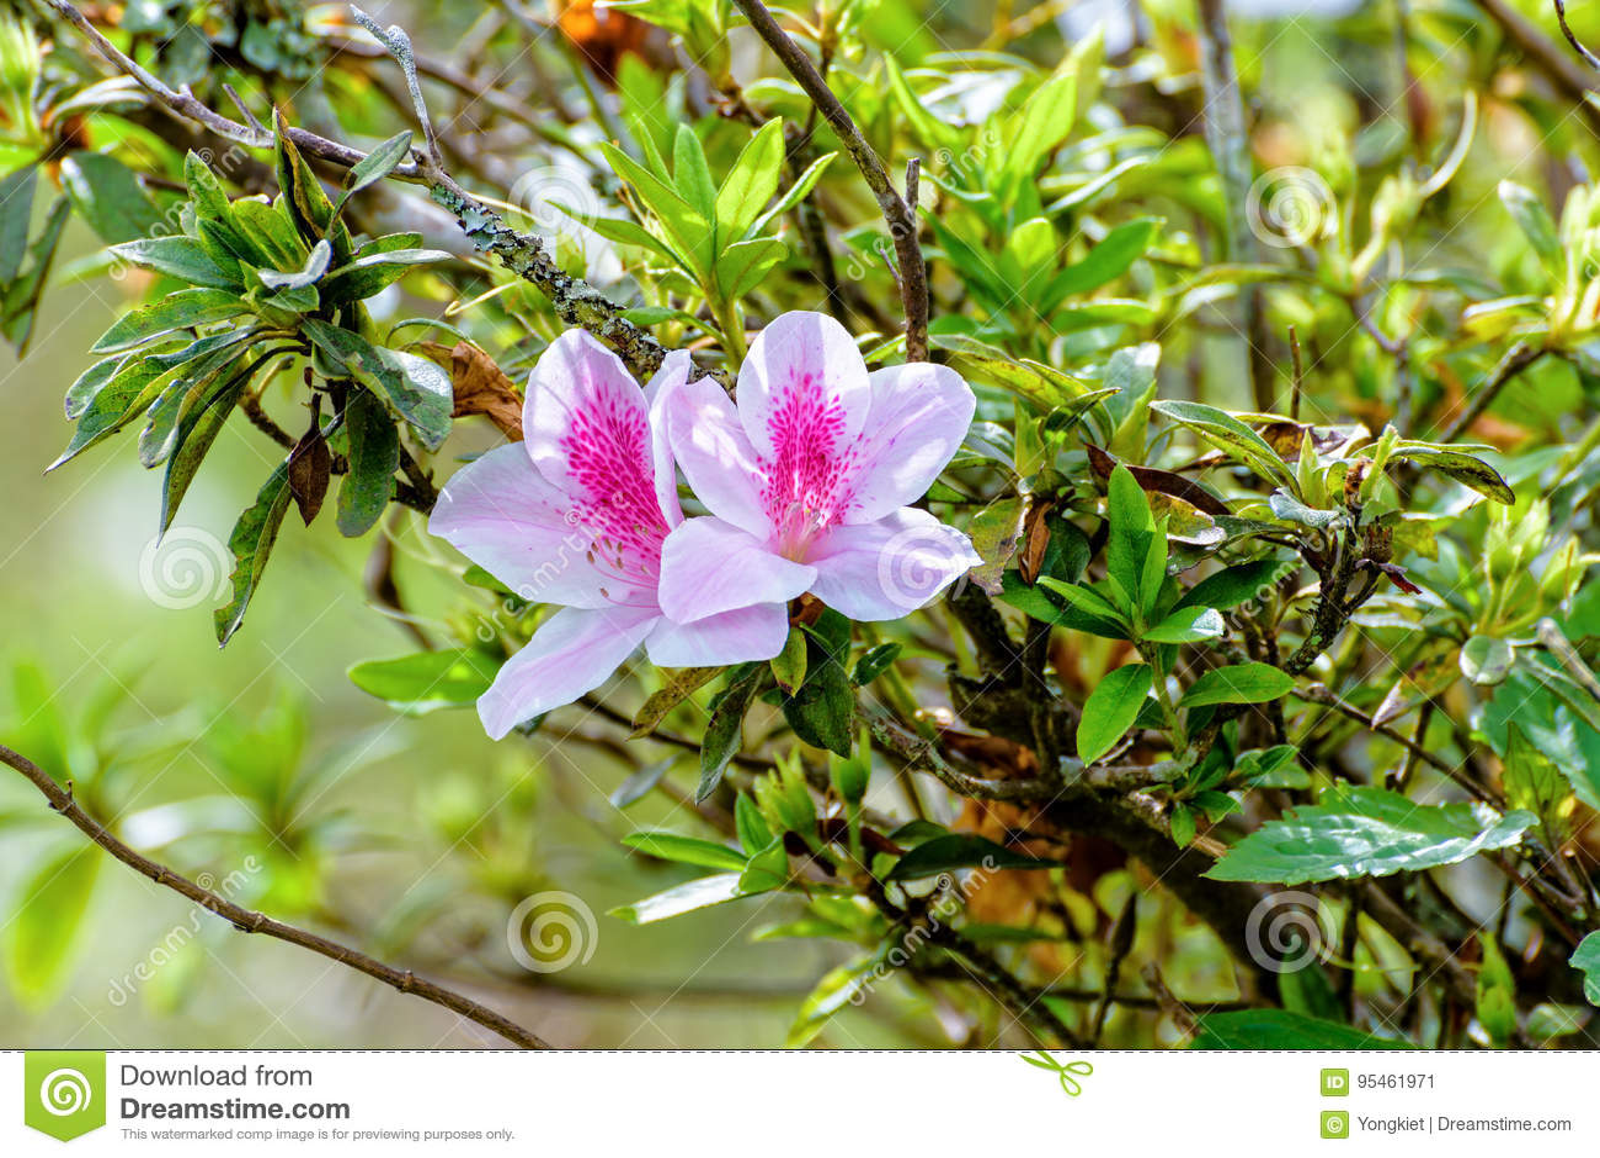 George Taber Azalea Stock Image Image Of Blooming Green 95461971